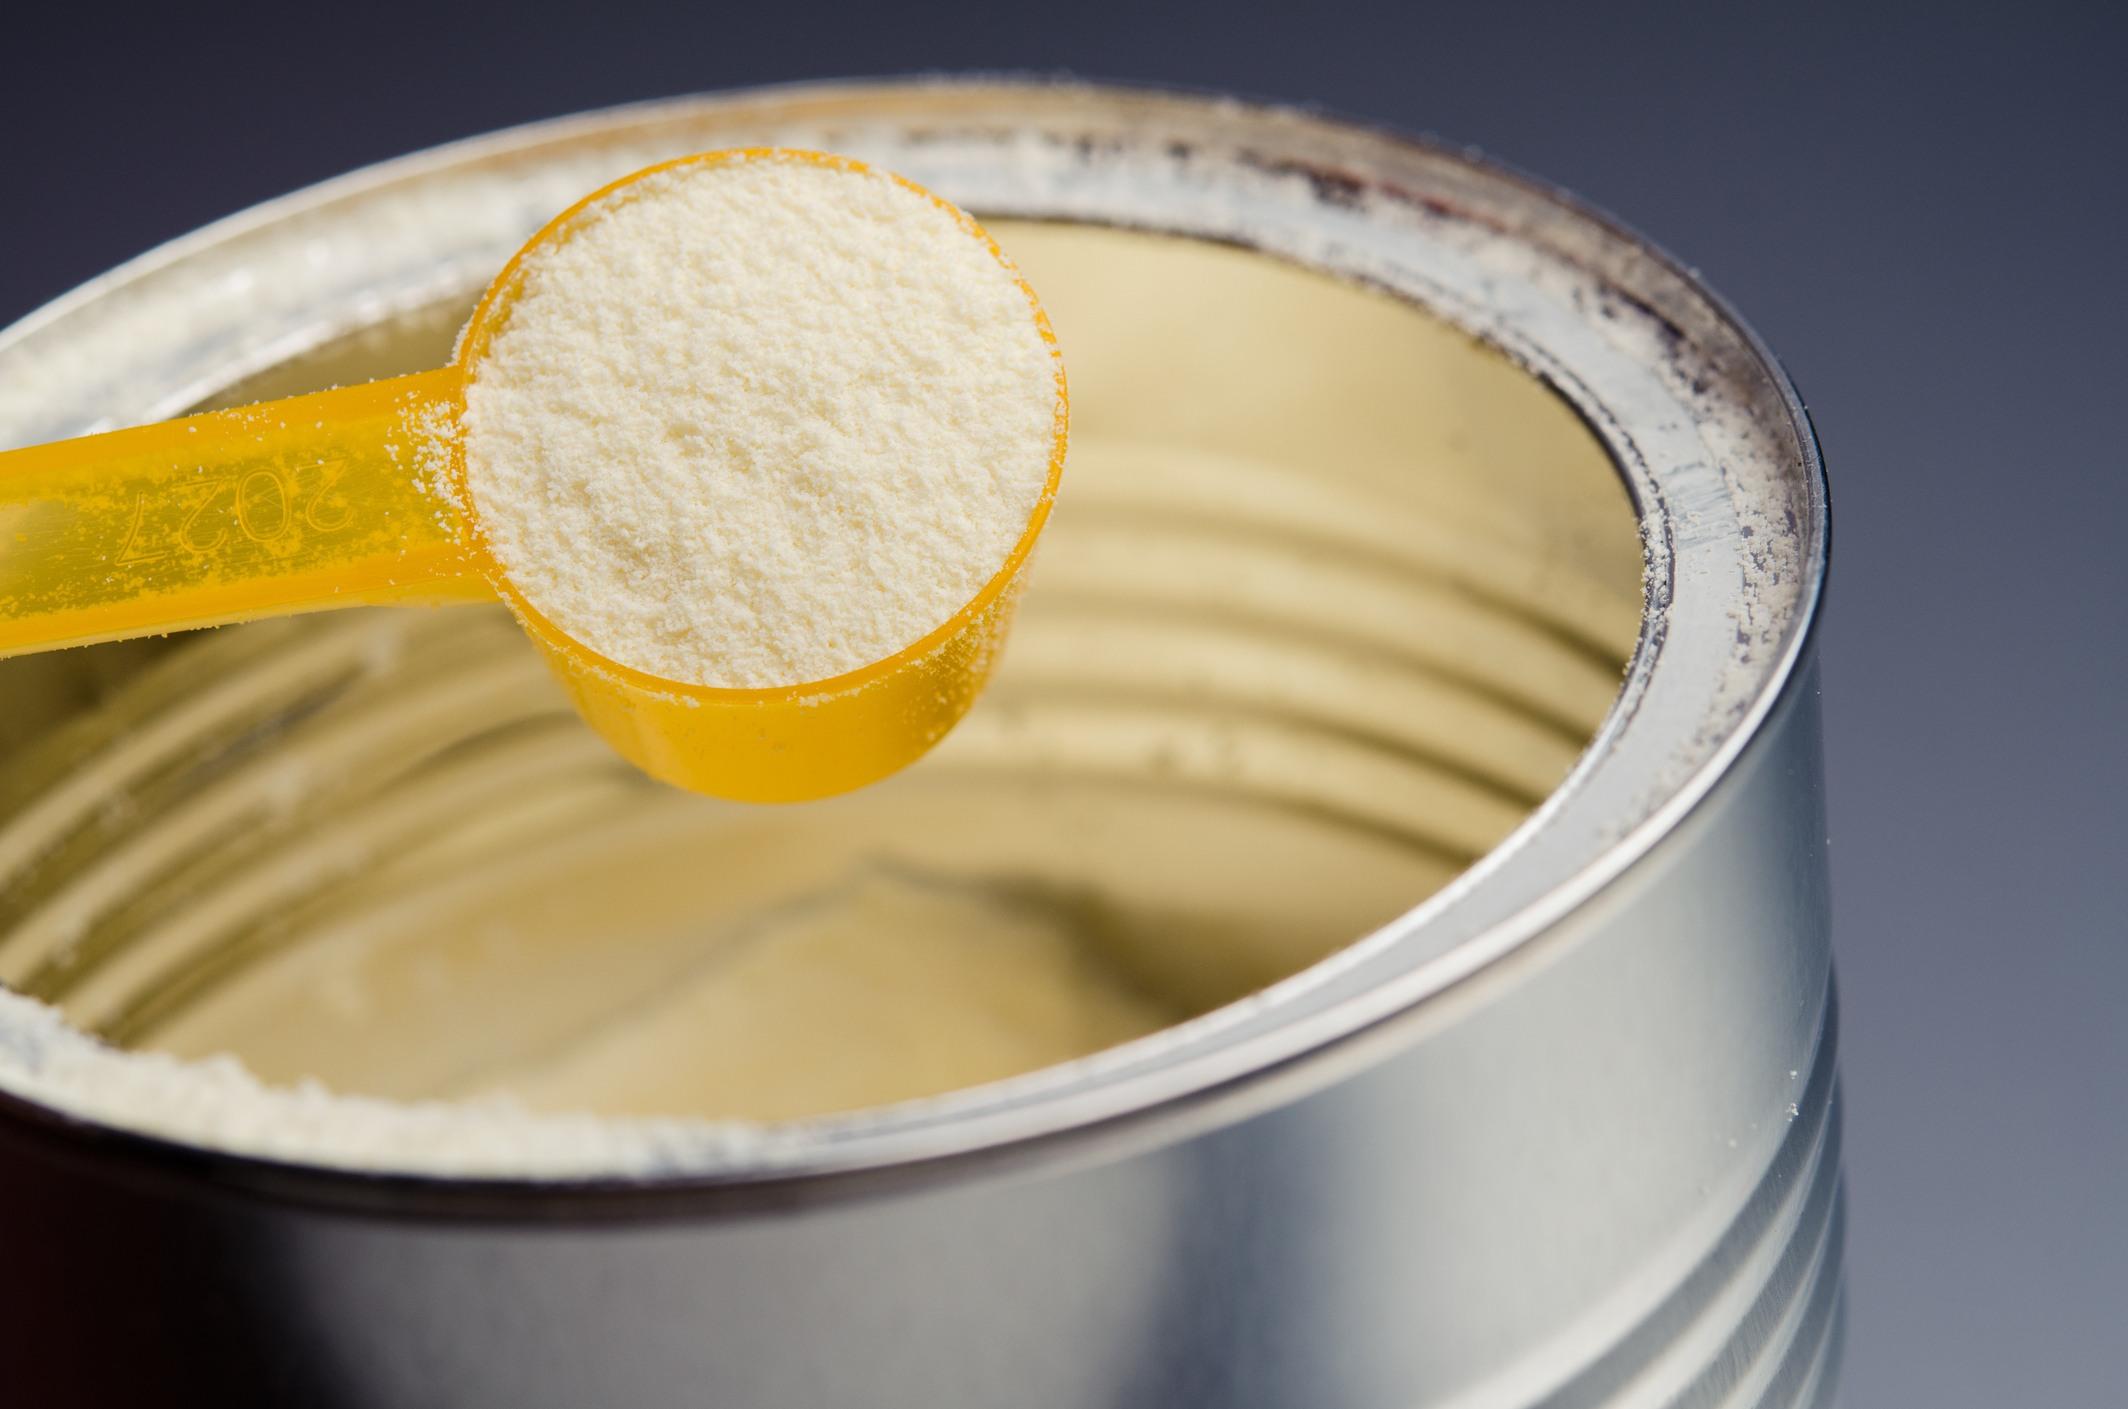 Powdered milk or infant formula